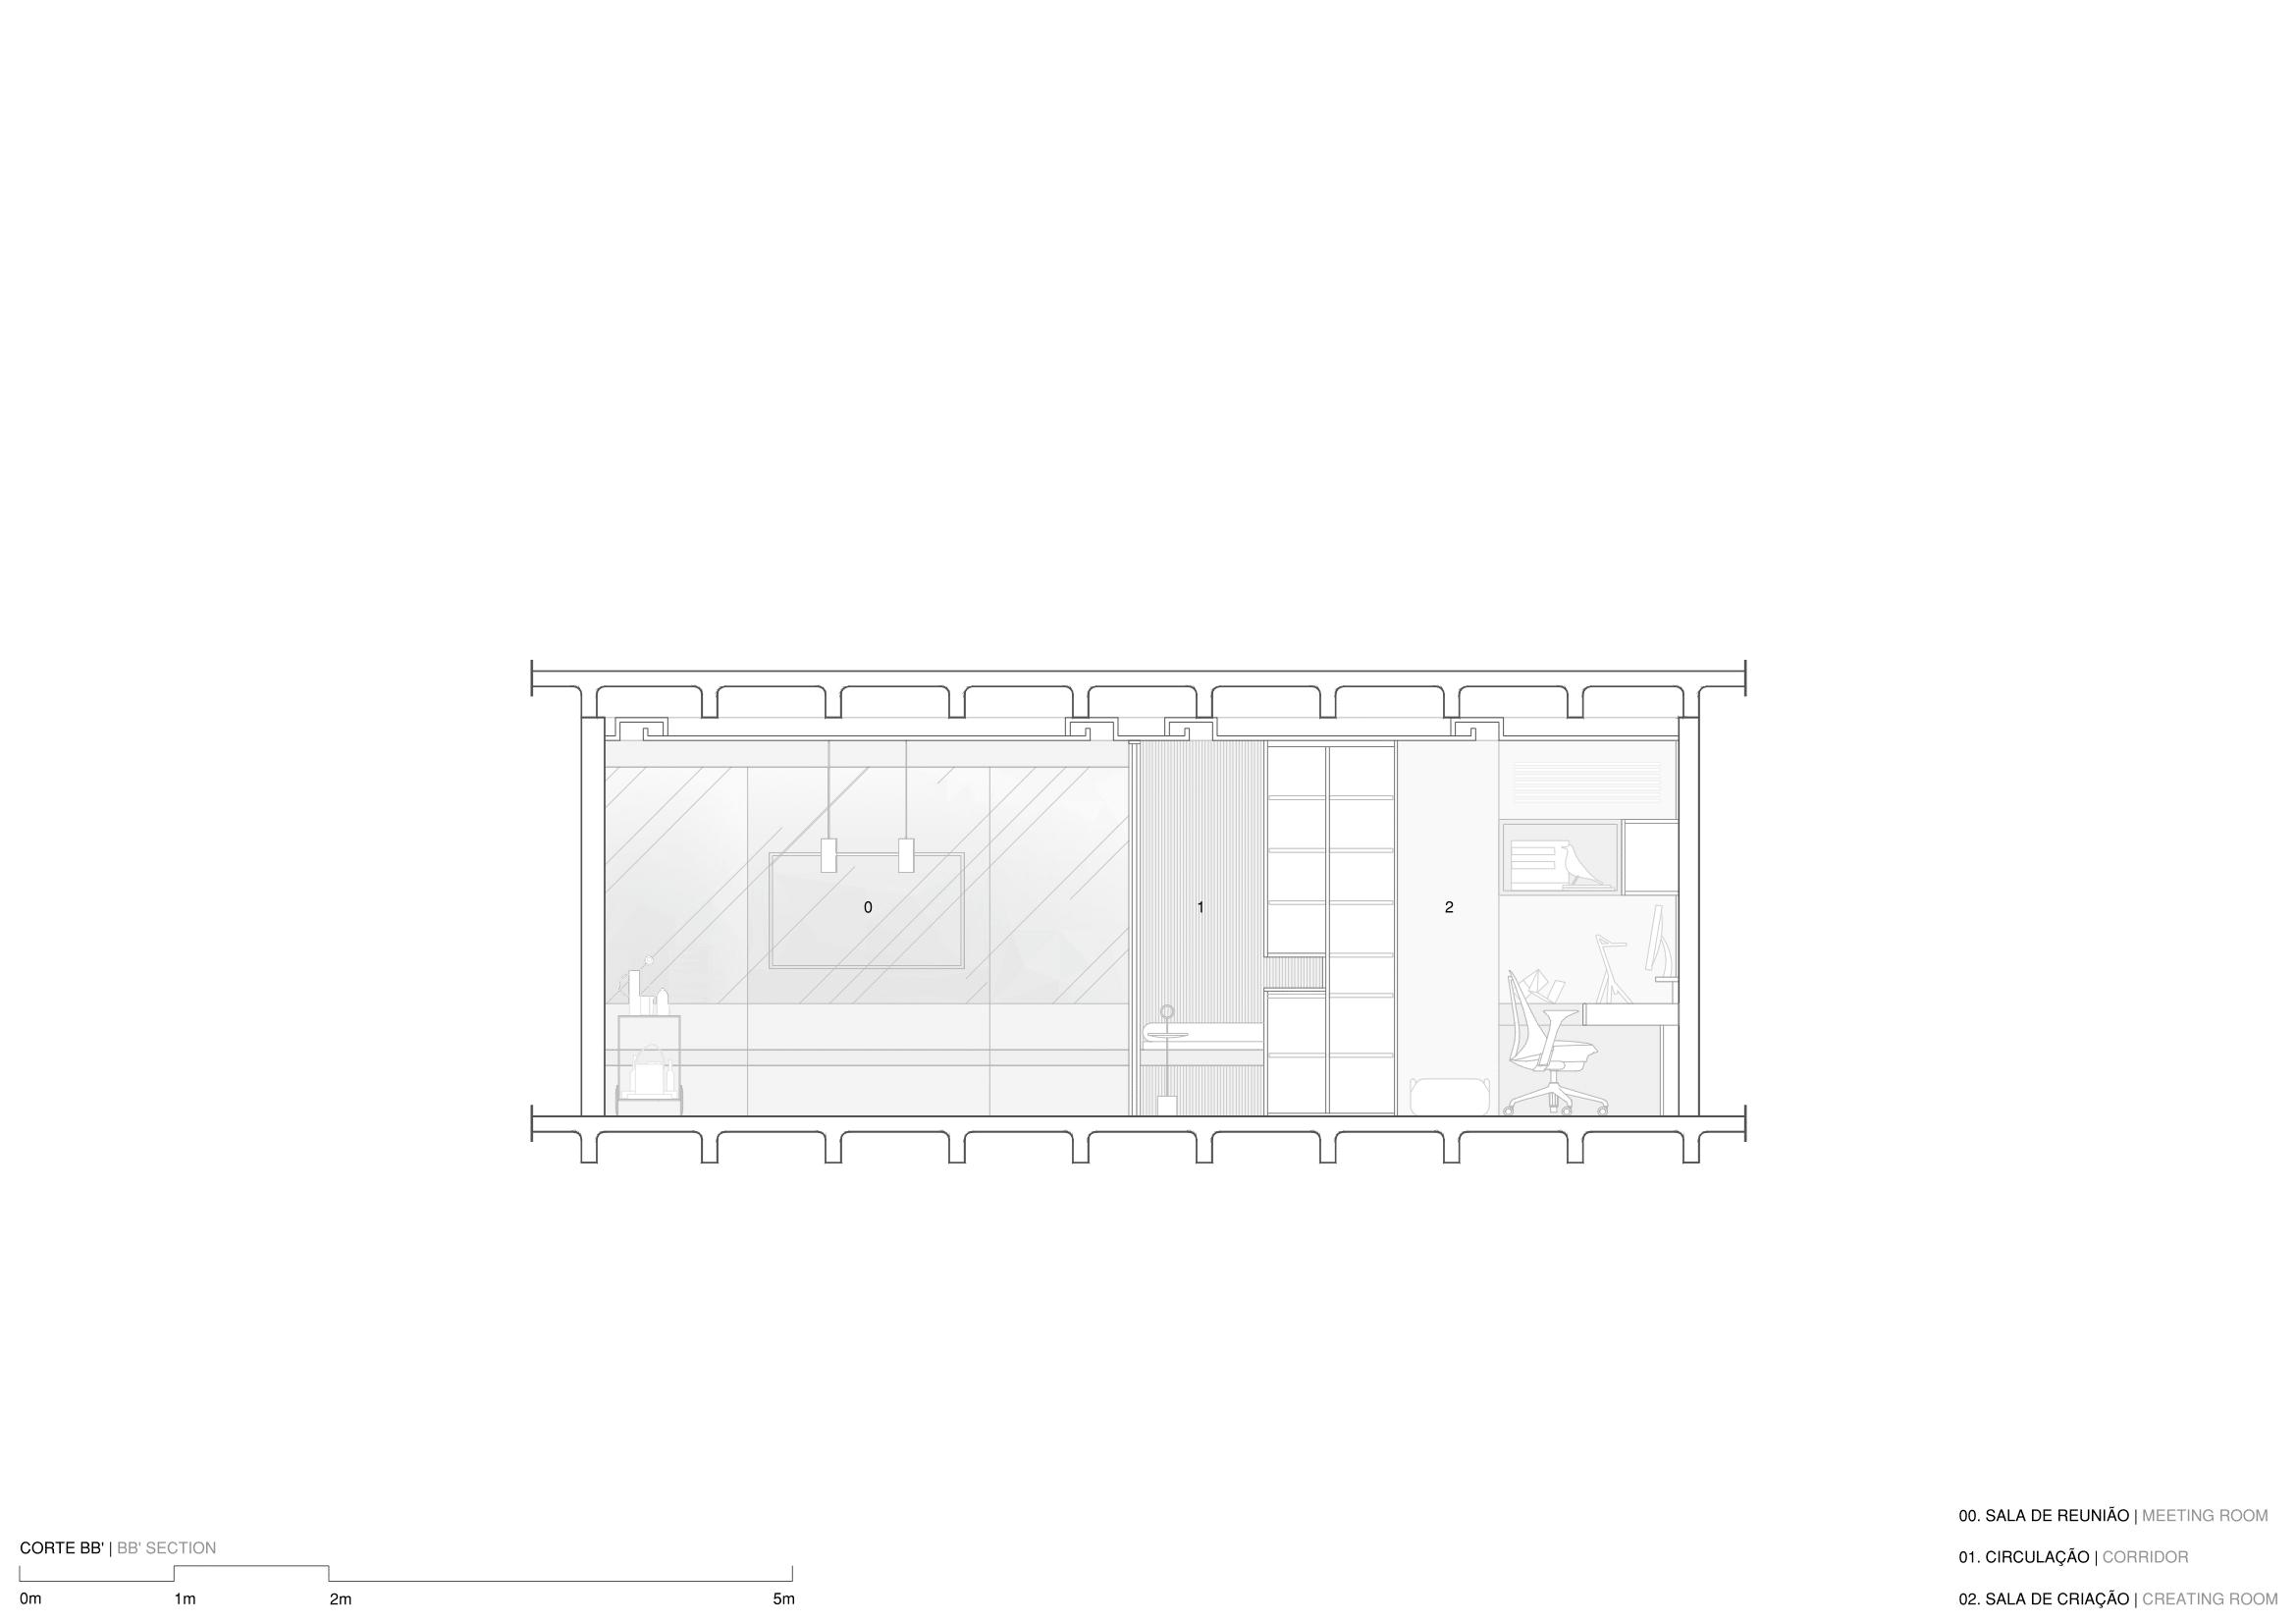 hobjeto-arquitetura-editora-zit-ap-03-cortebb